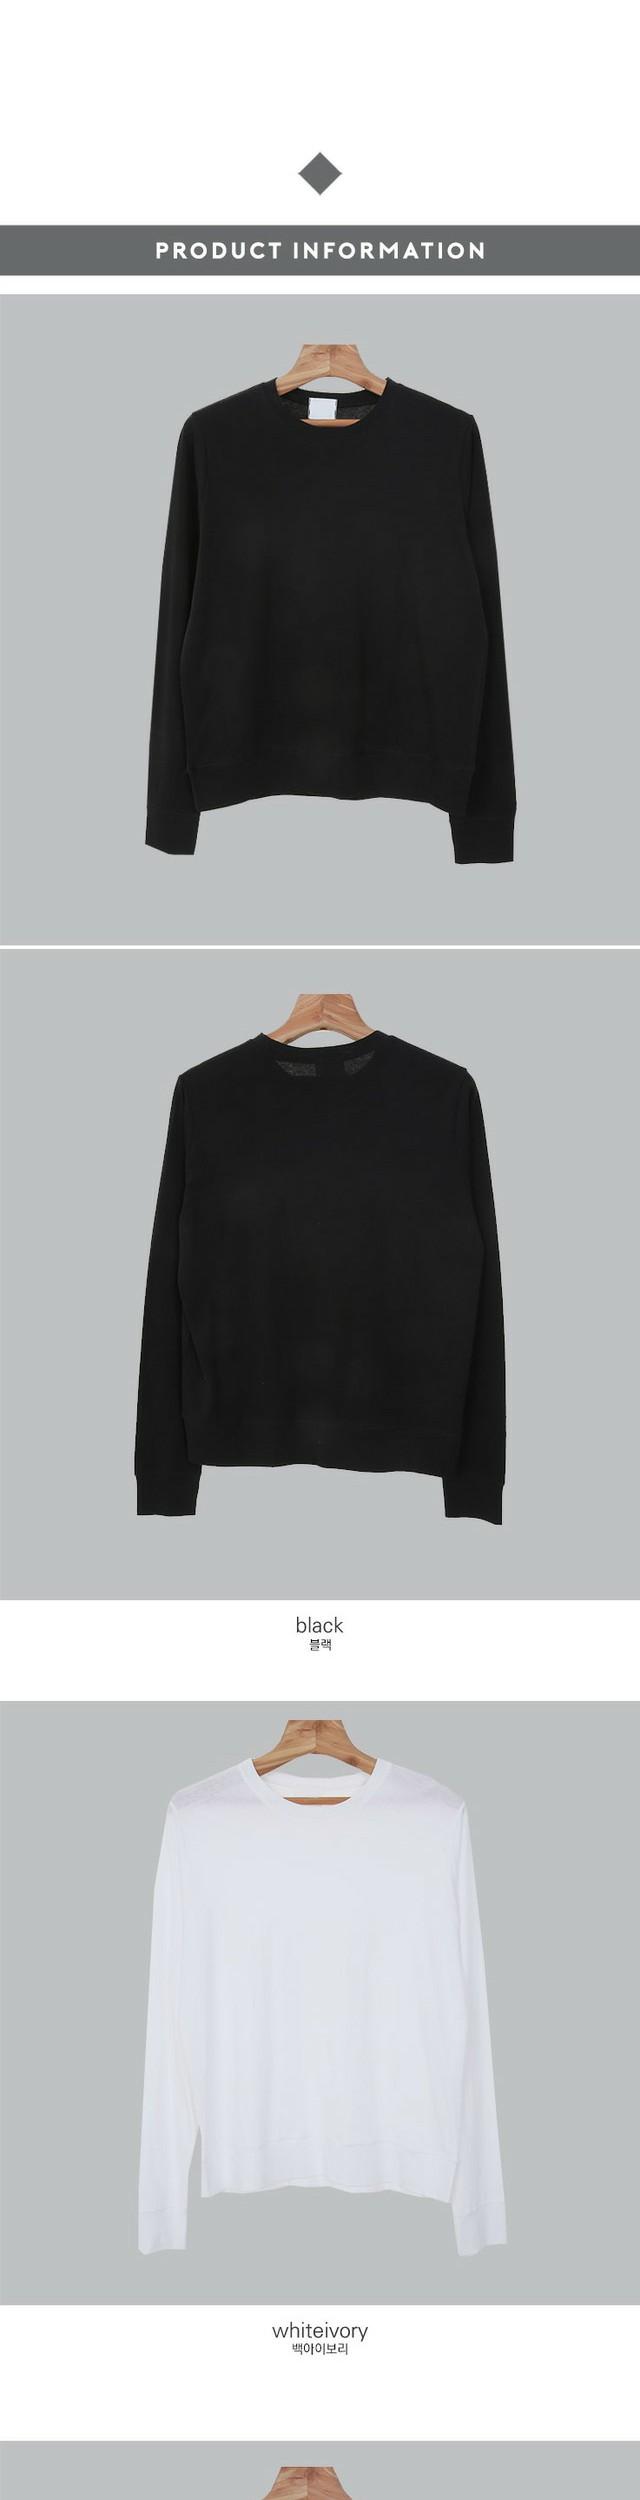 Palette-Basic T-shirt